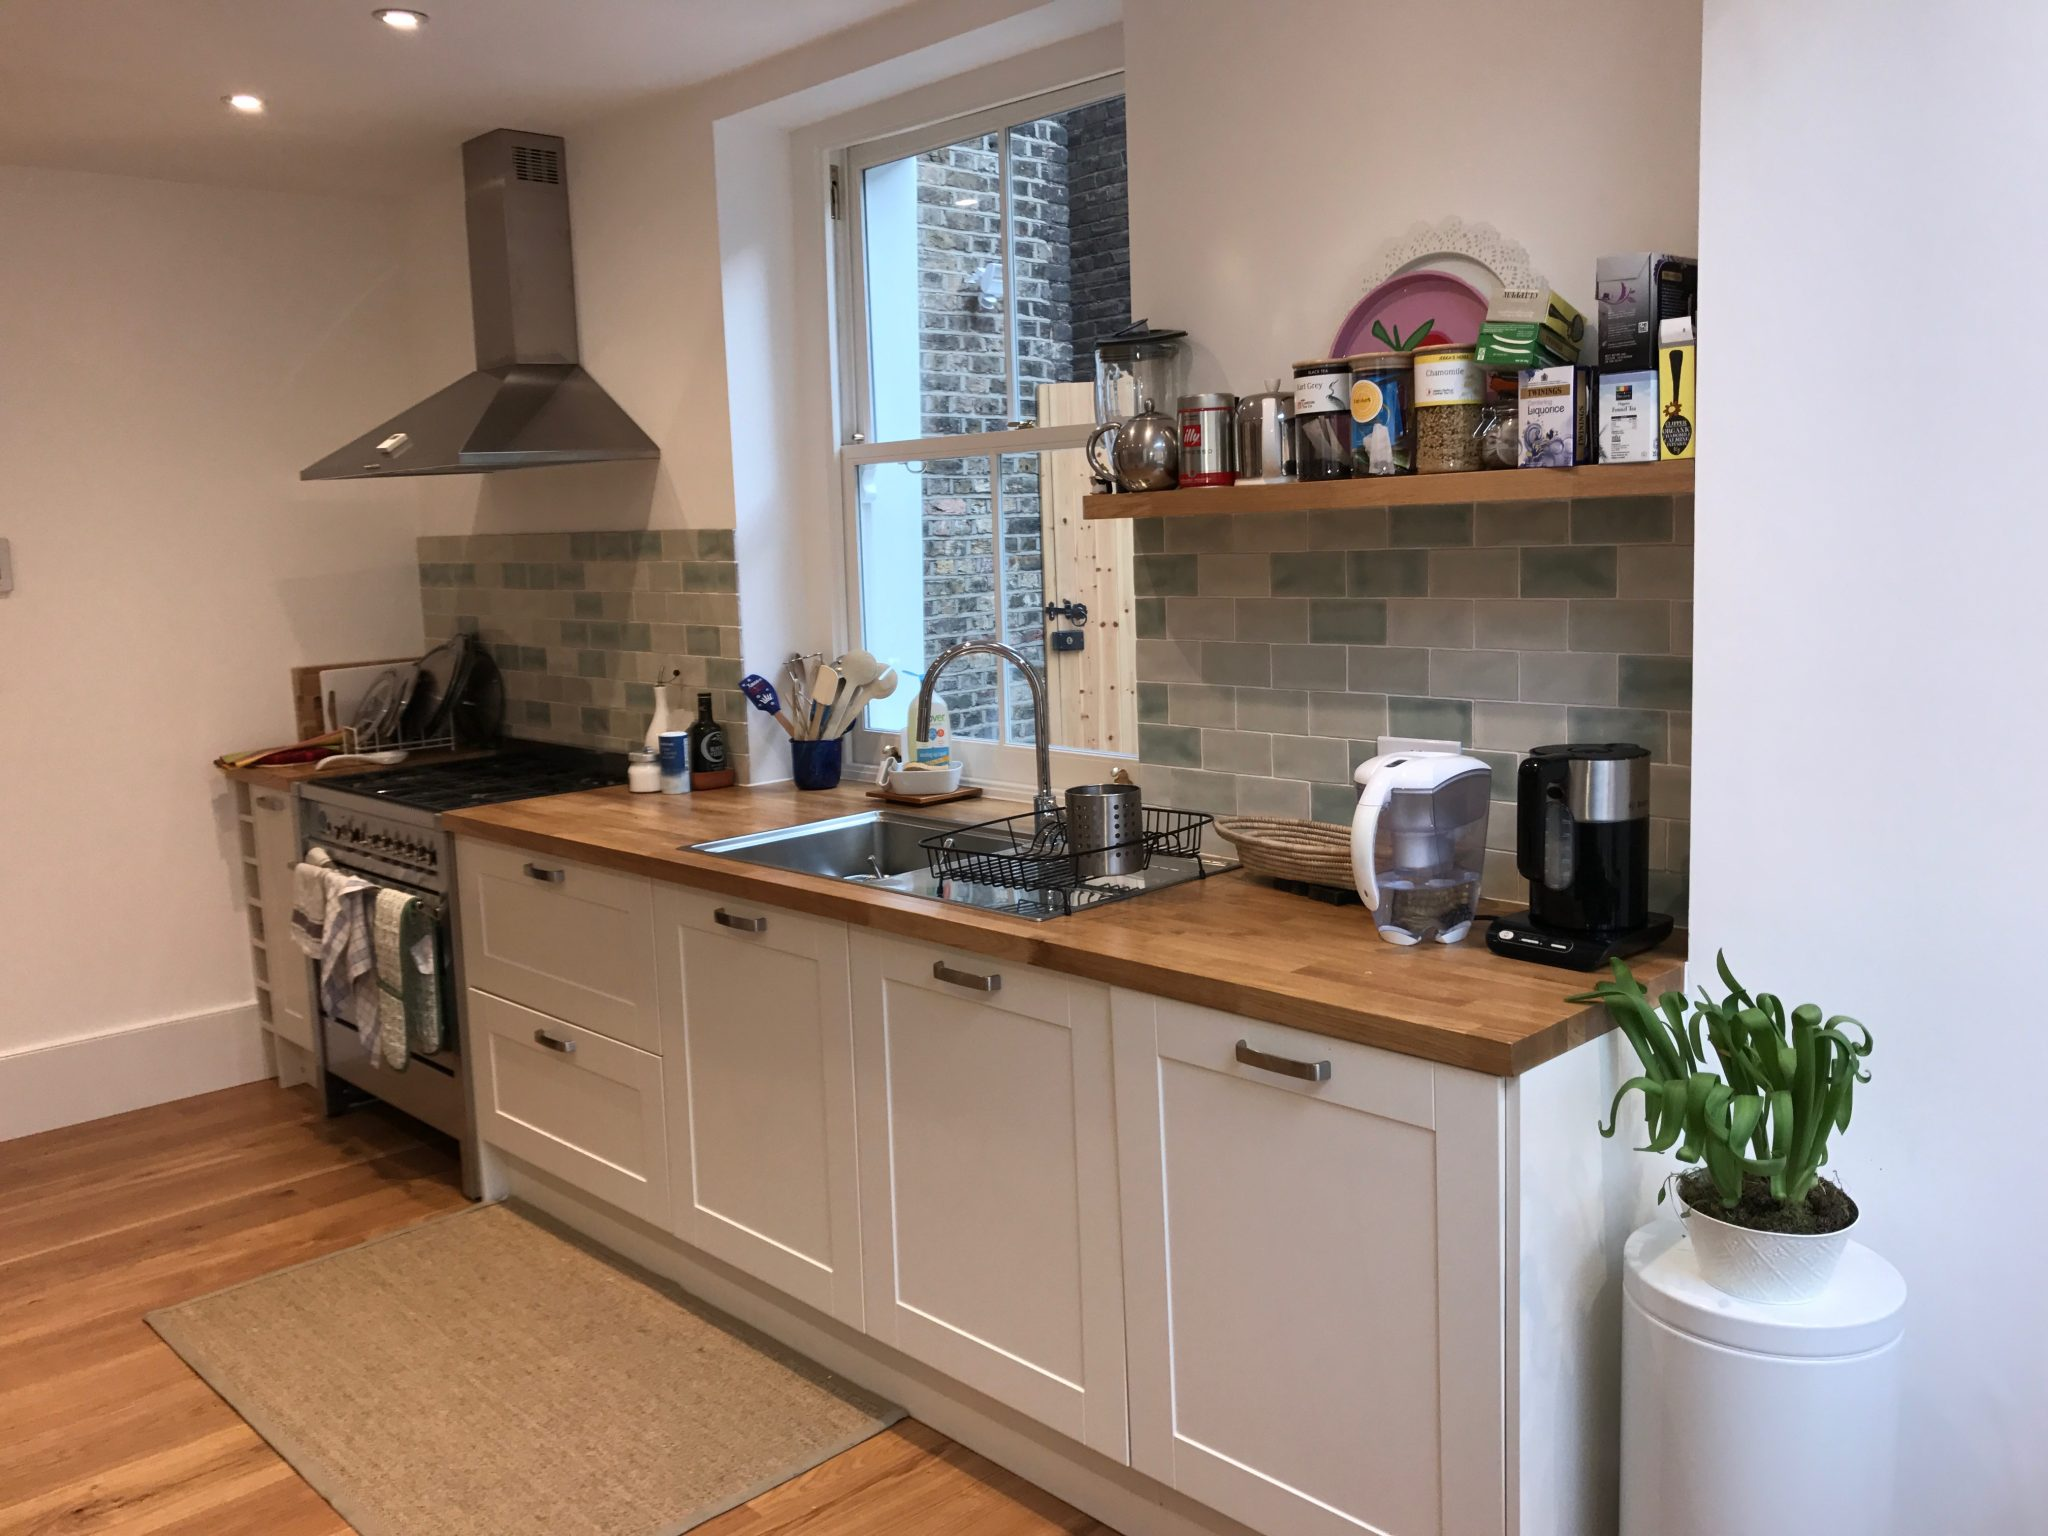 IMG 1182 - Kitchens